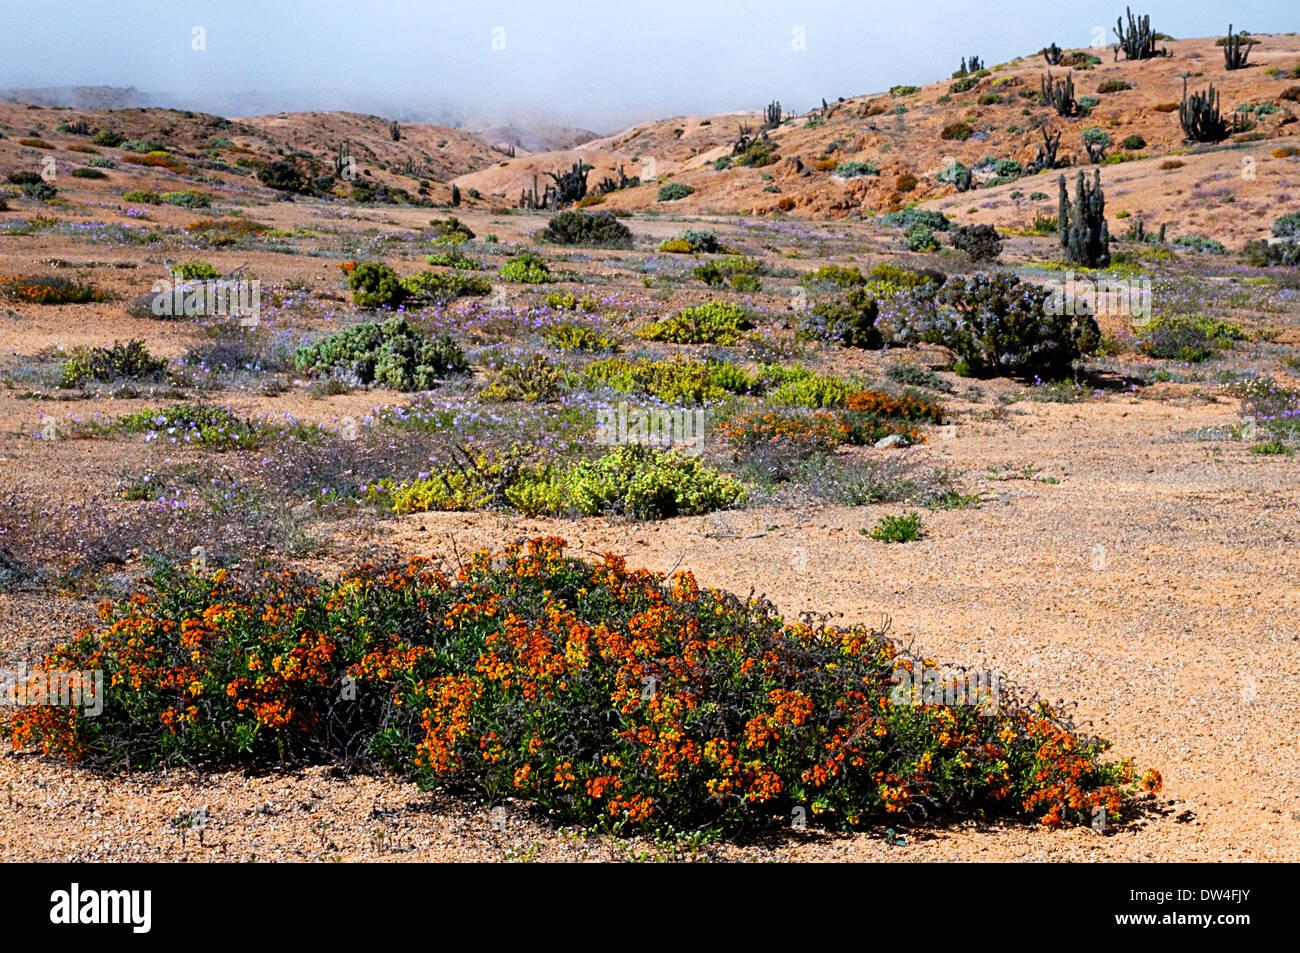 The Desierto Florido or flowering desert, Pan de Azúcar National Park, Atacama, Antofagasta Region, Chile, South America - Stock Image